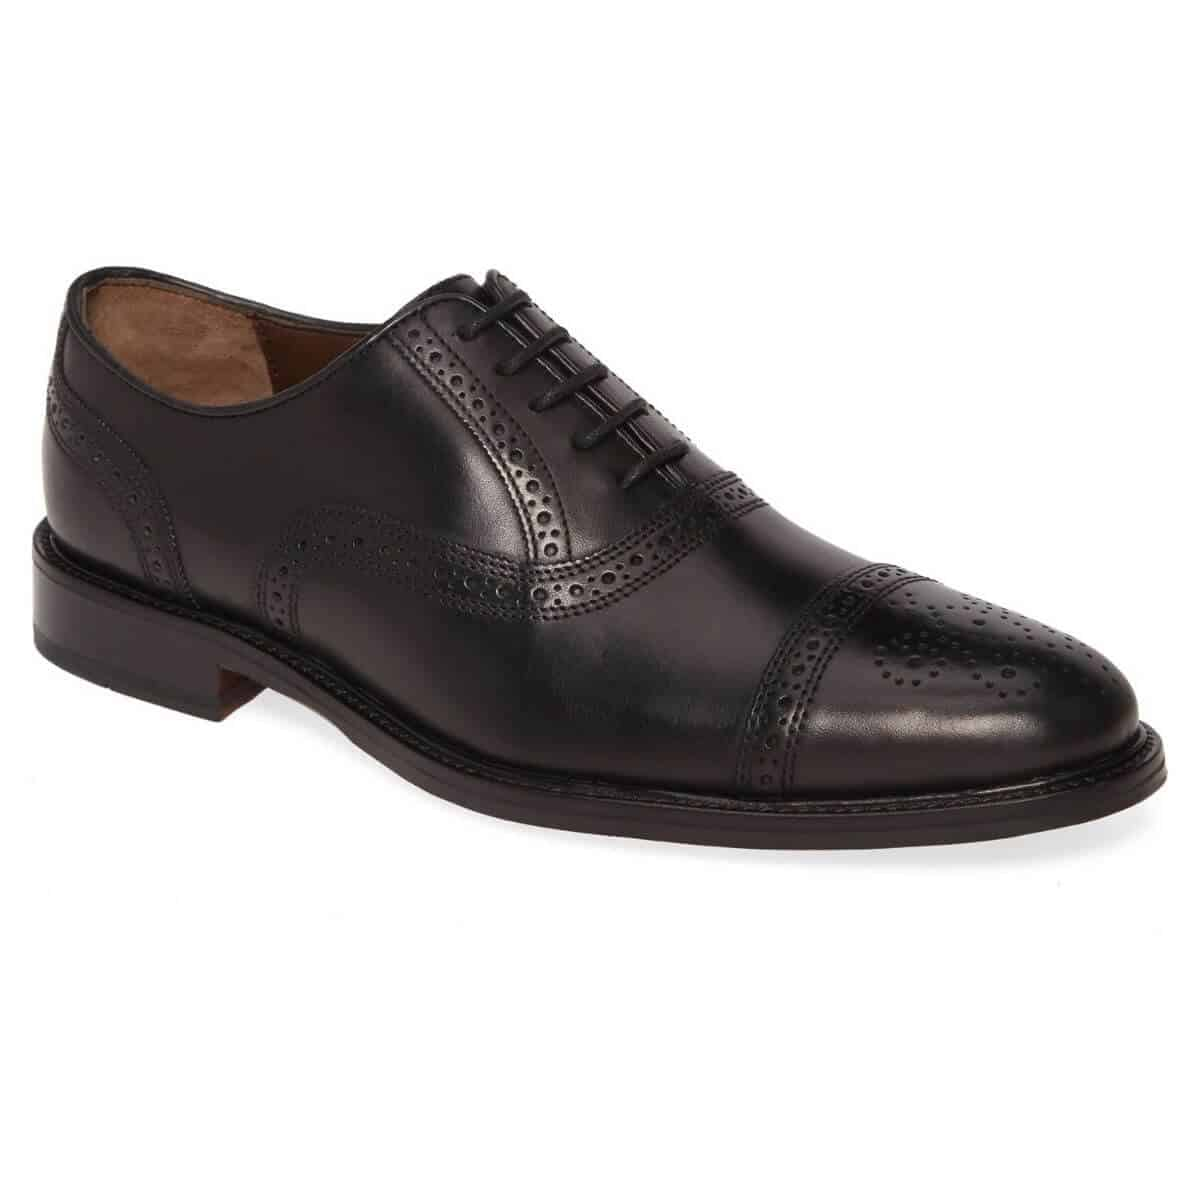 Black leather cap-toe Oxford shoe.